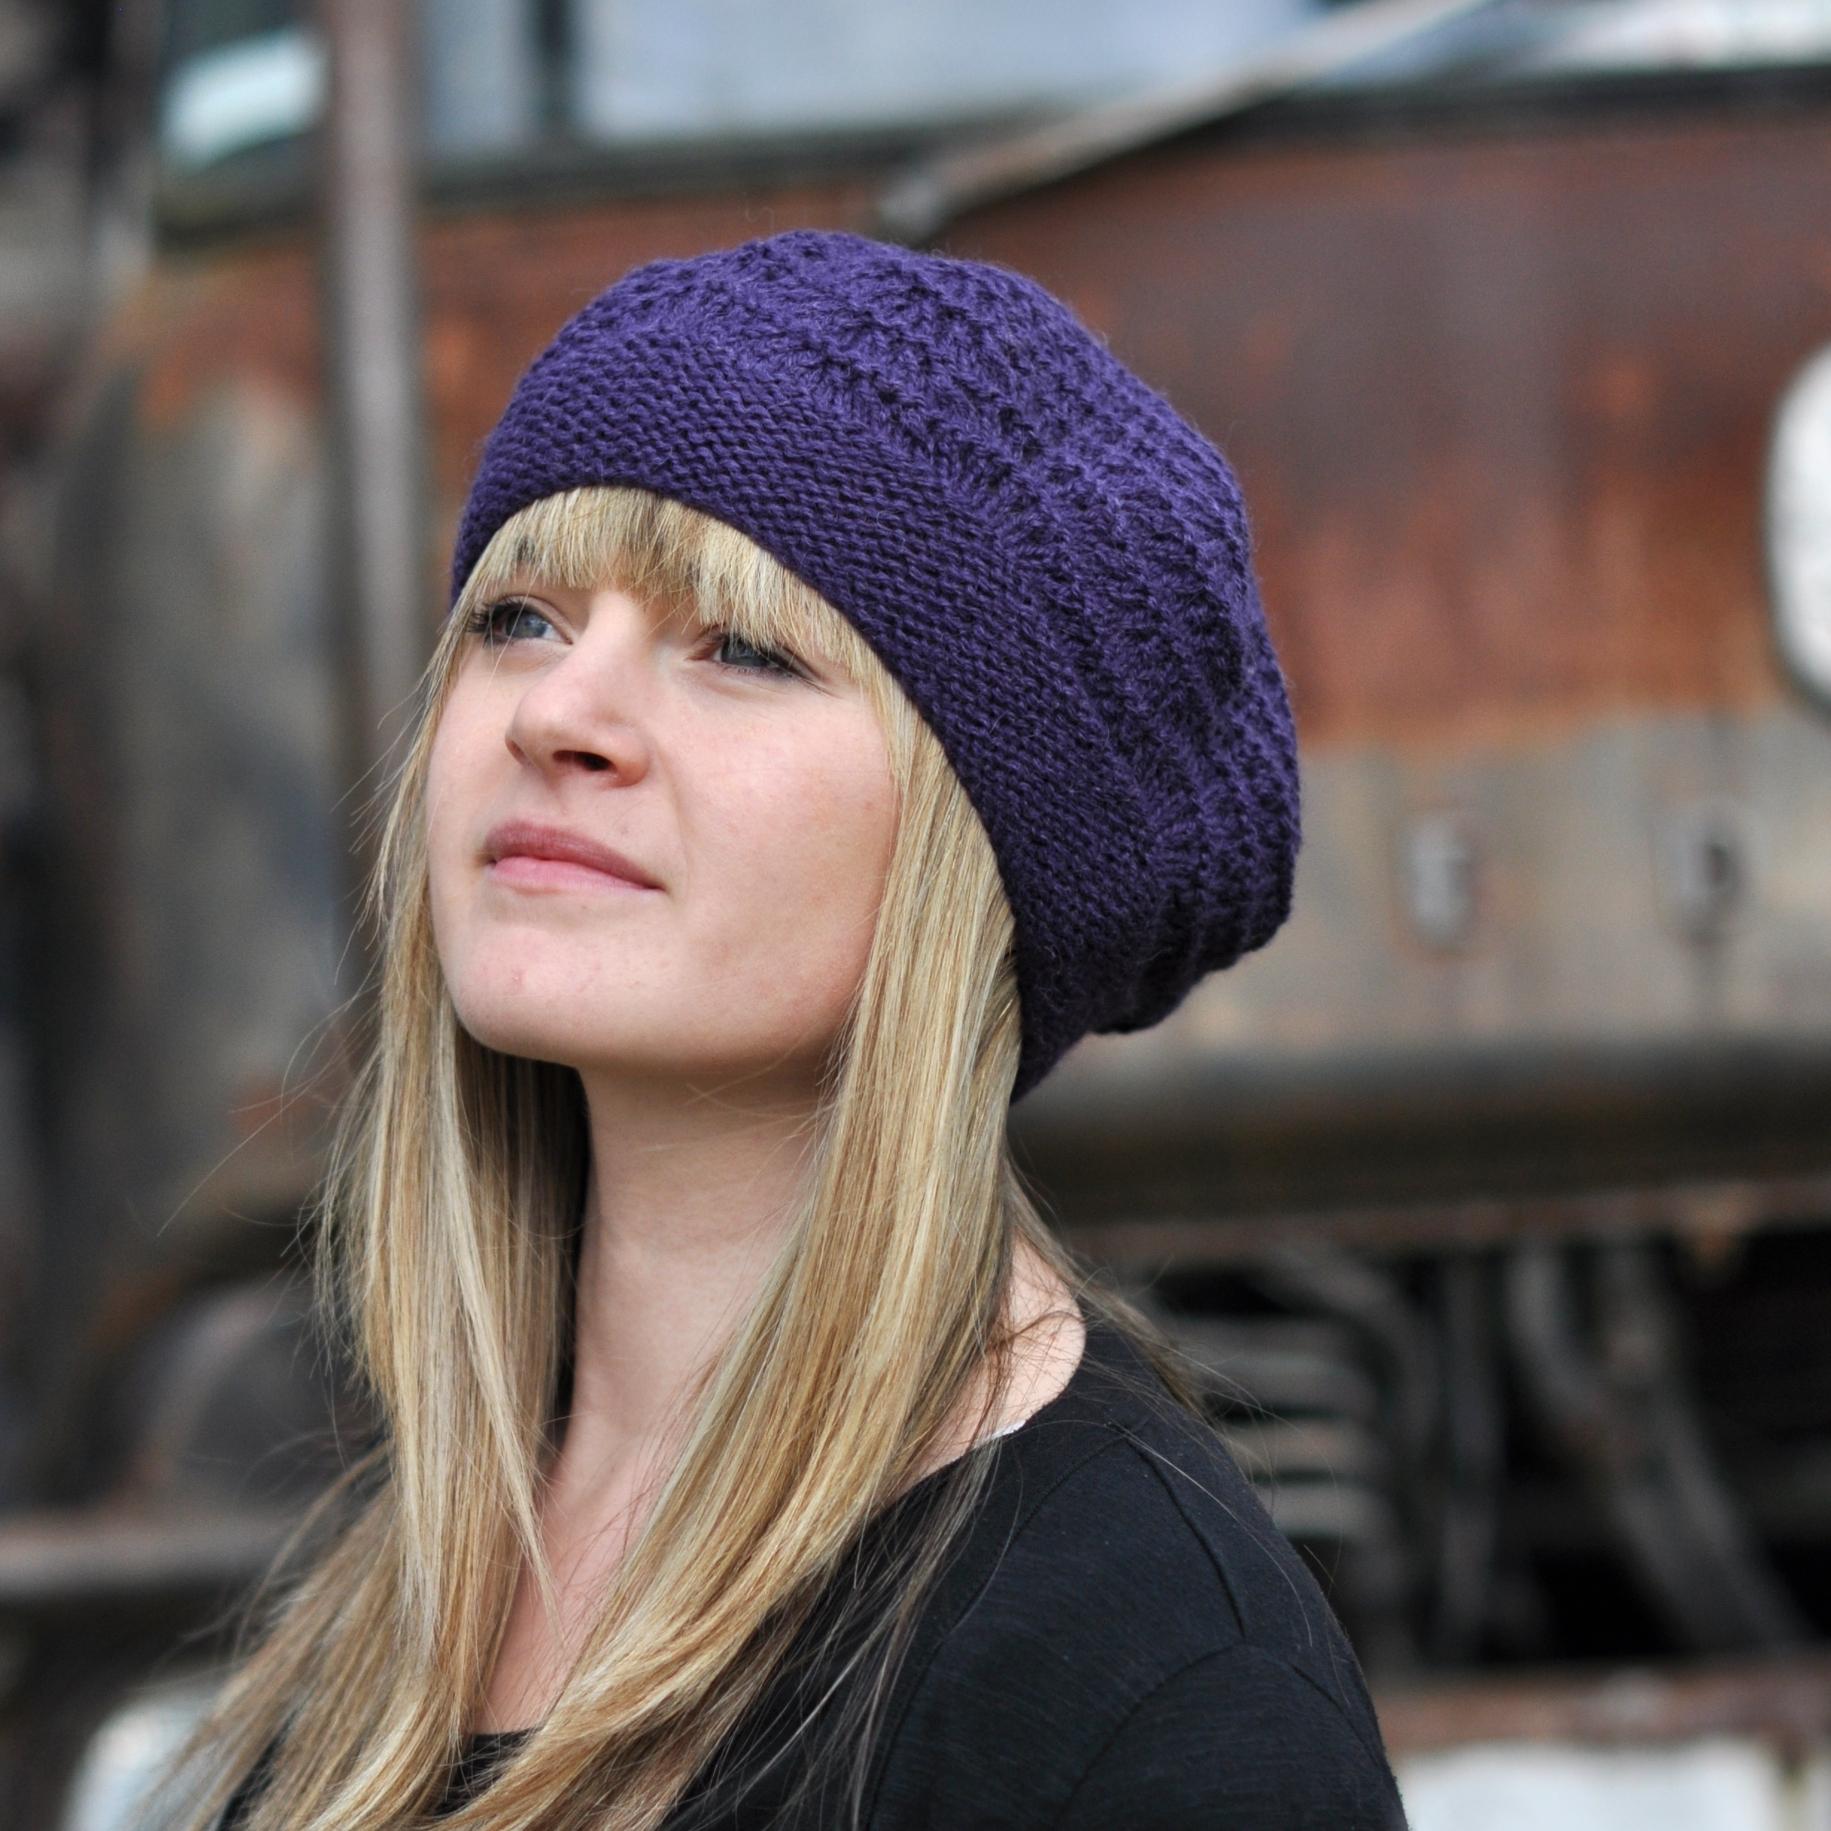 Mayrose lace beret knitting pattern